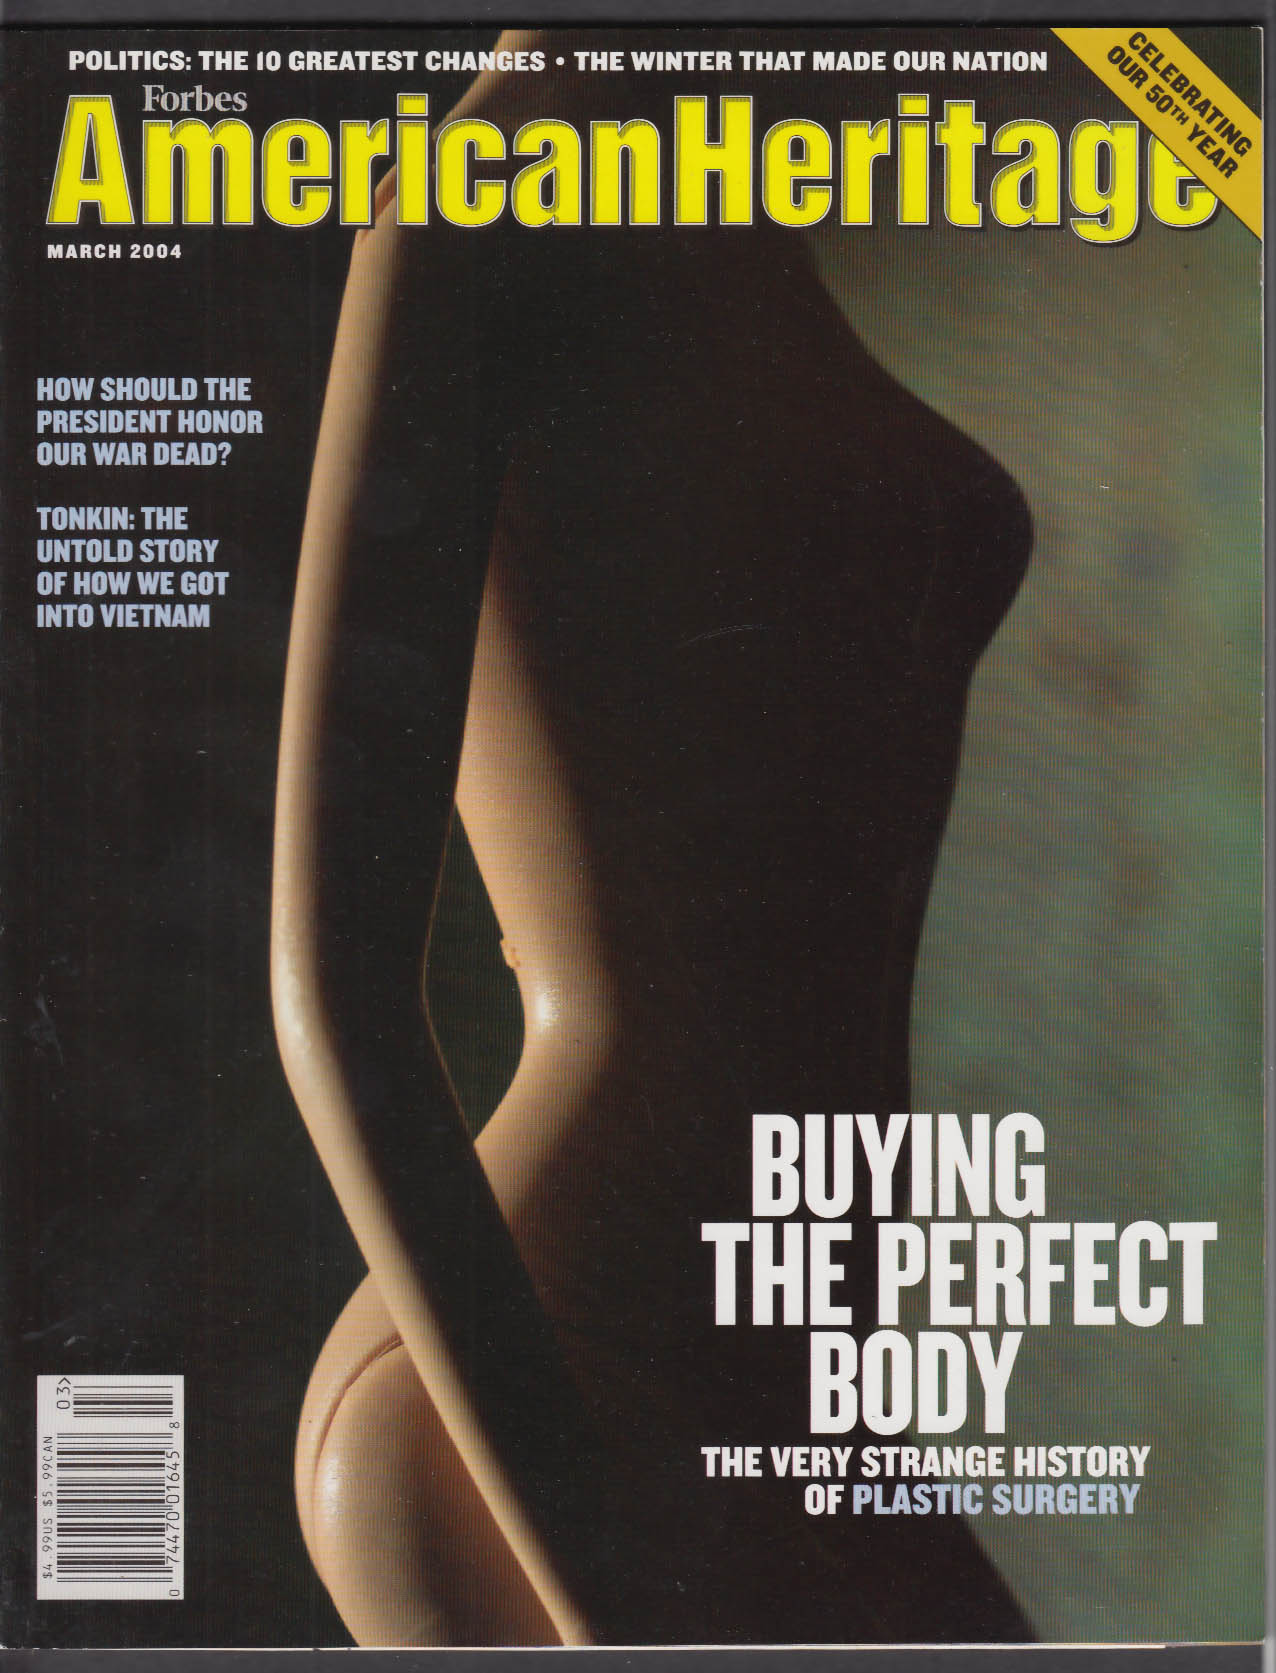 AMERICAN HERITAGE Cosmetic Surgery Gulf of Tonkin Vietnam + 3 2004